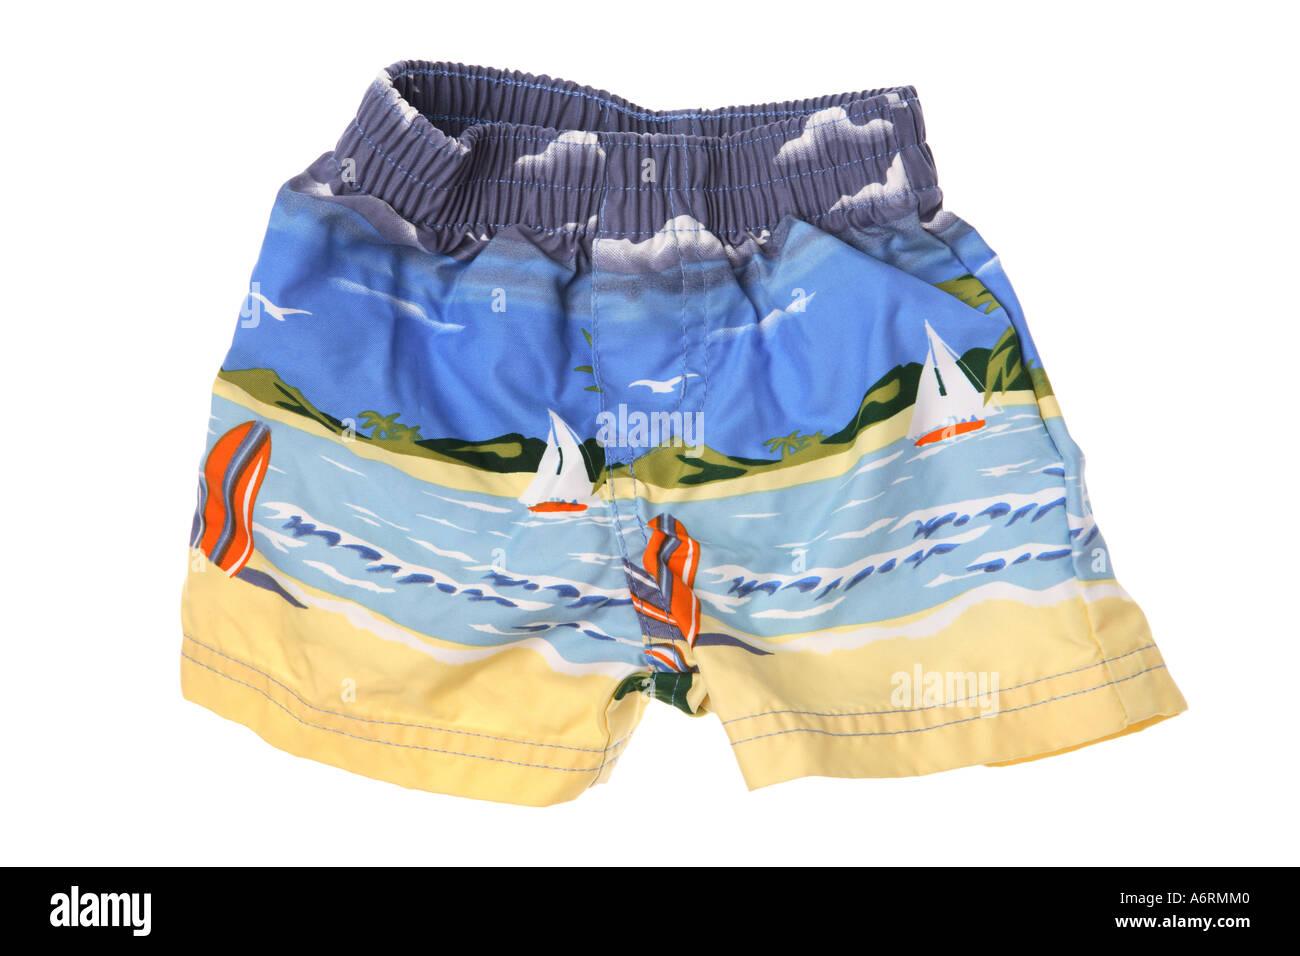 Swimming Trunks - Stock Image